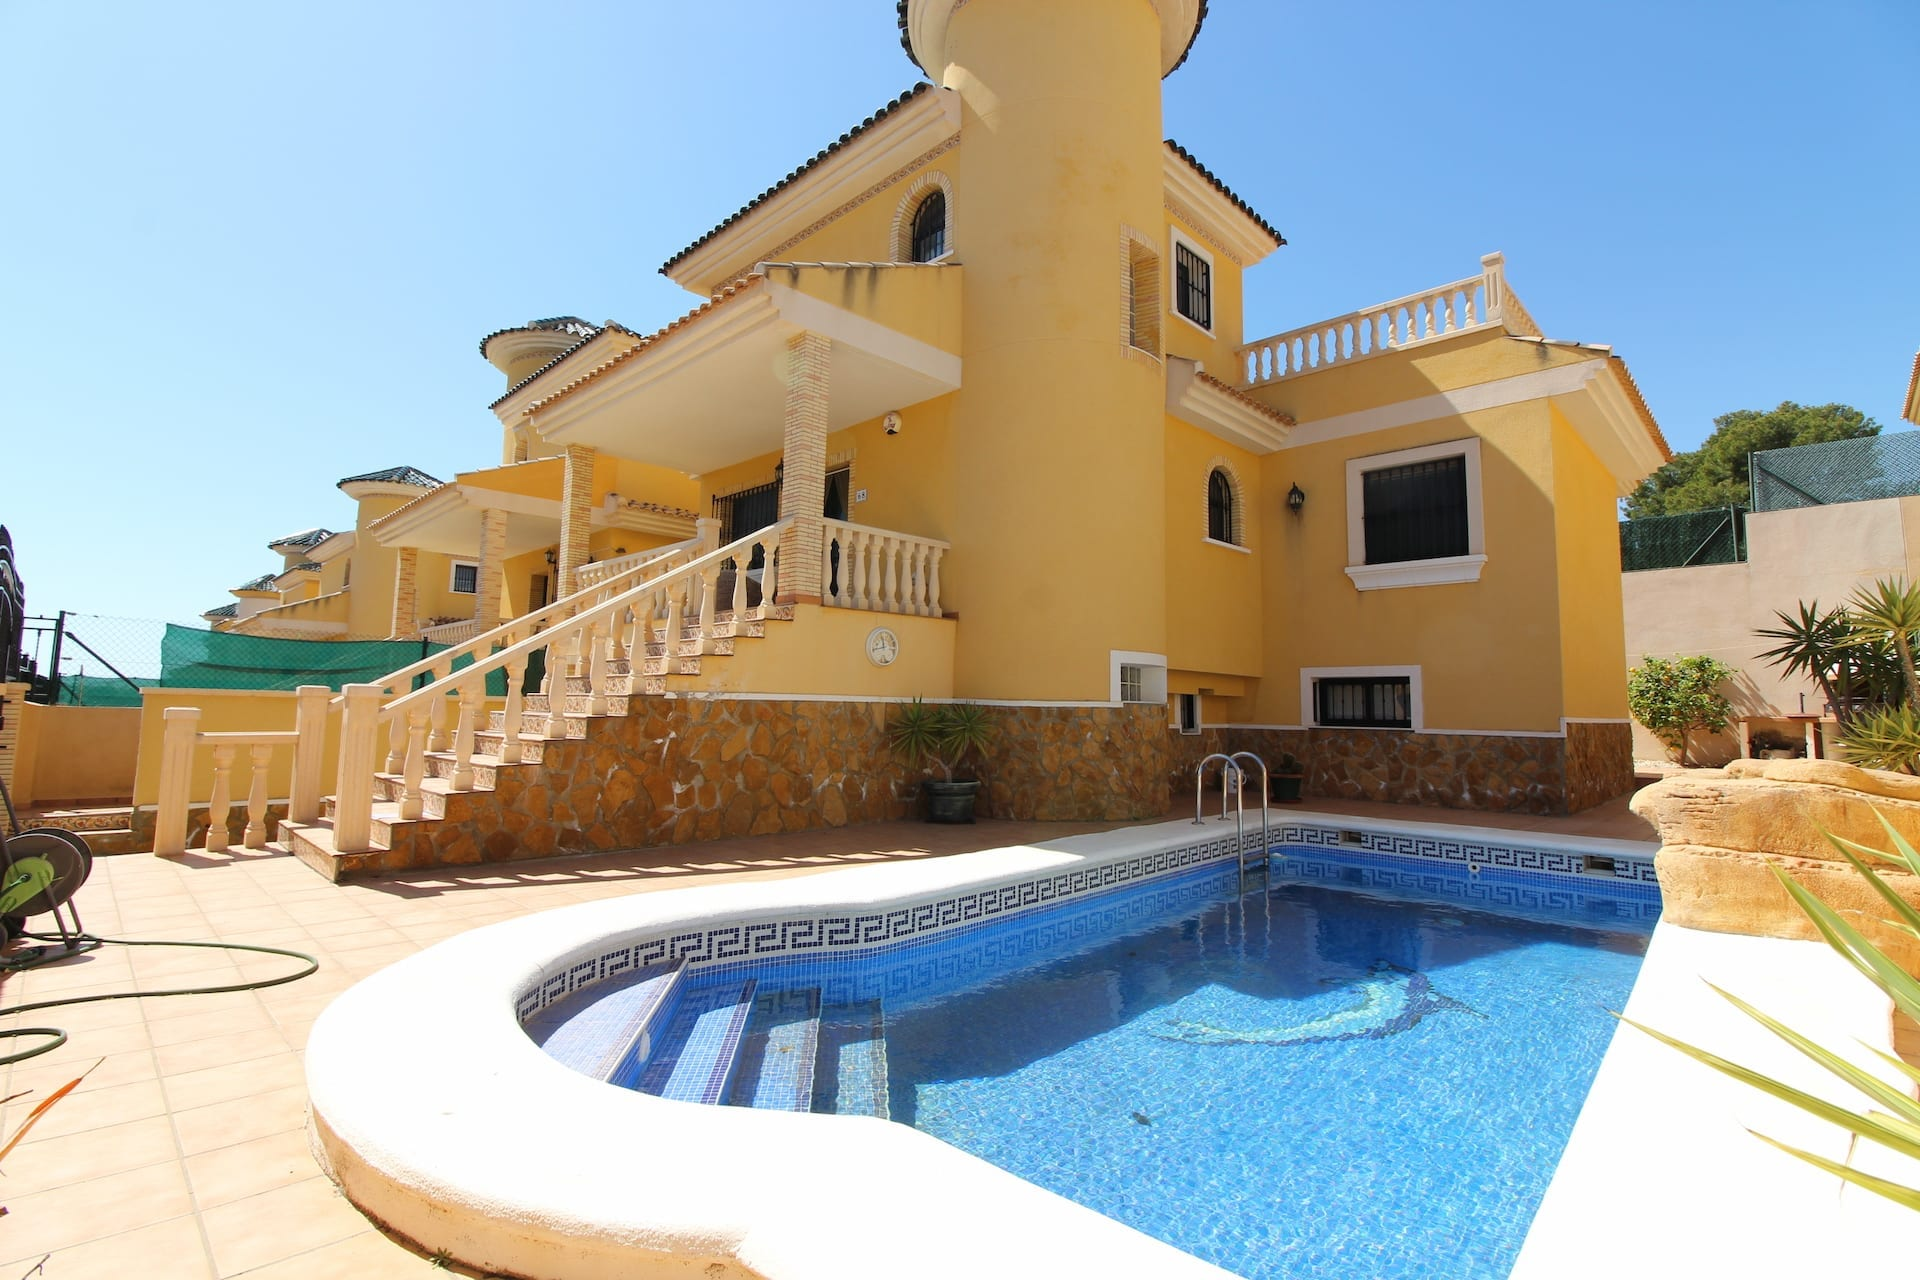 Bargain villa for sale reduced